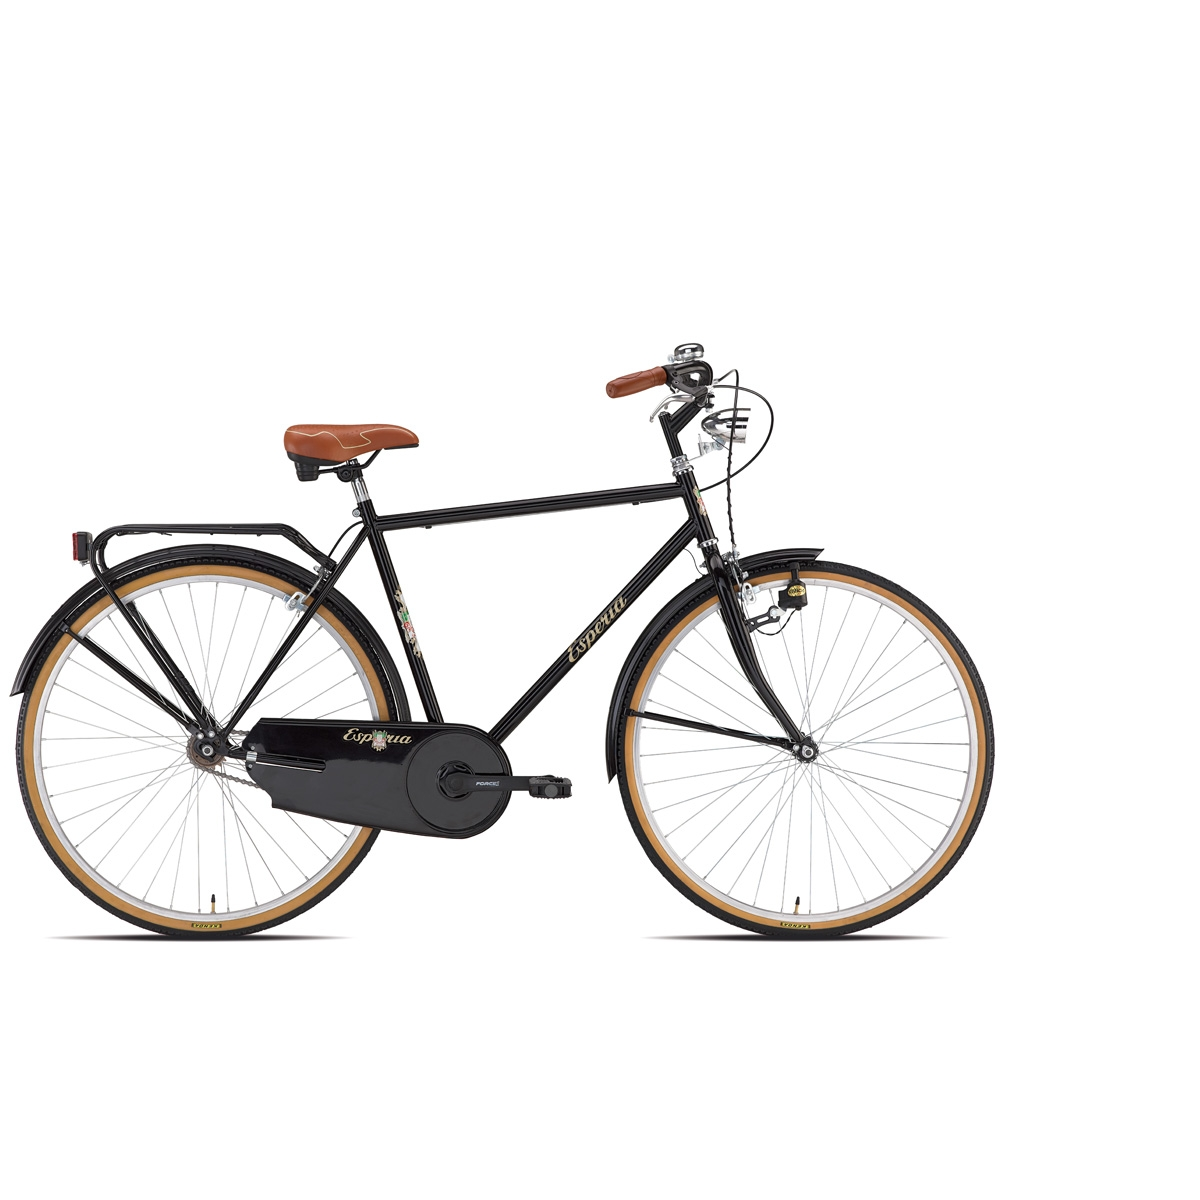 Vélo vintage Esperia homme 2280u Retro' Noir